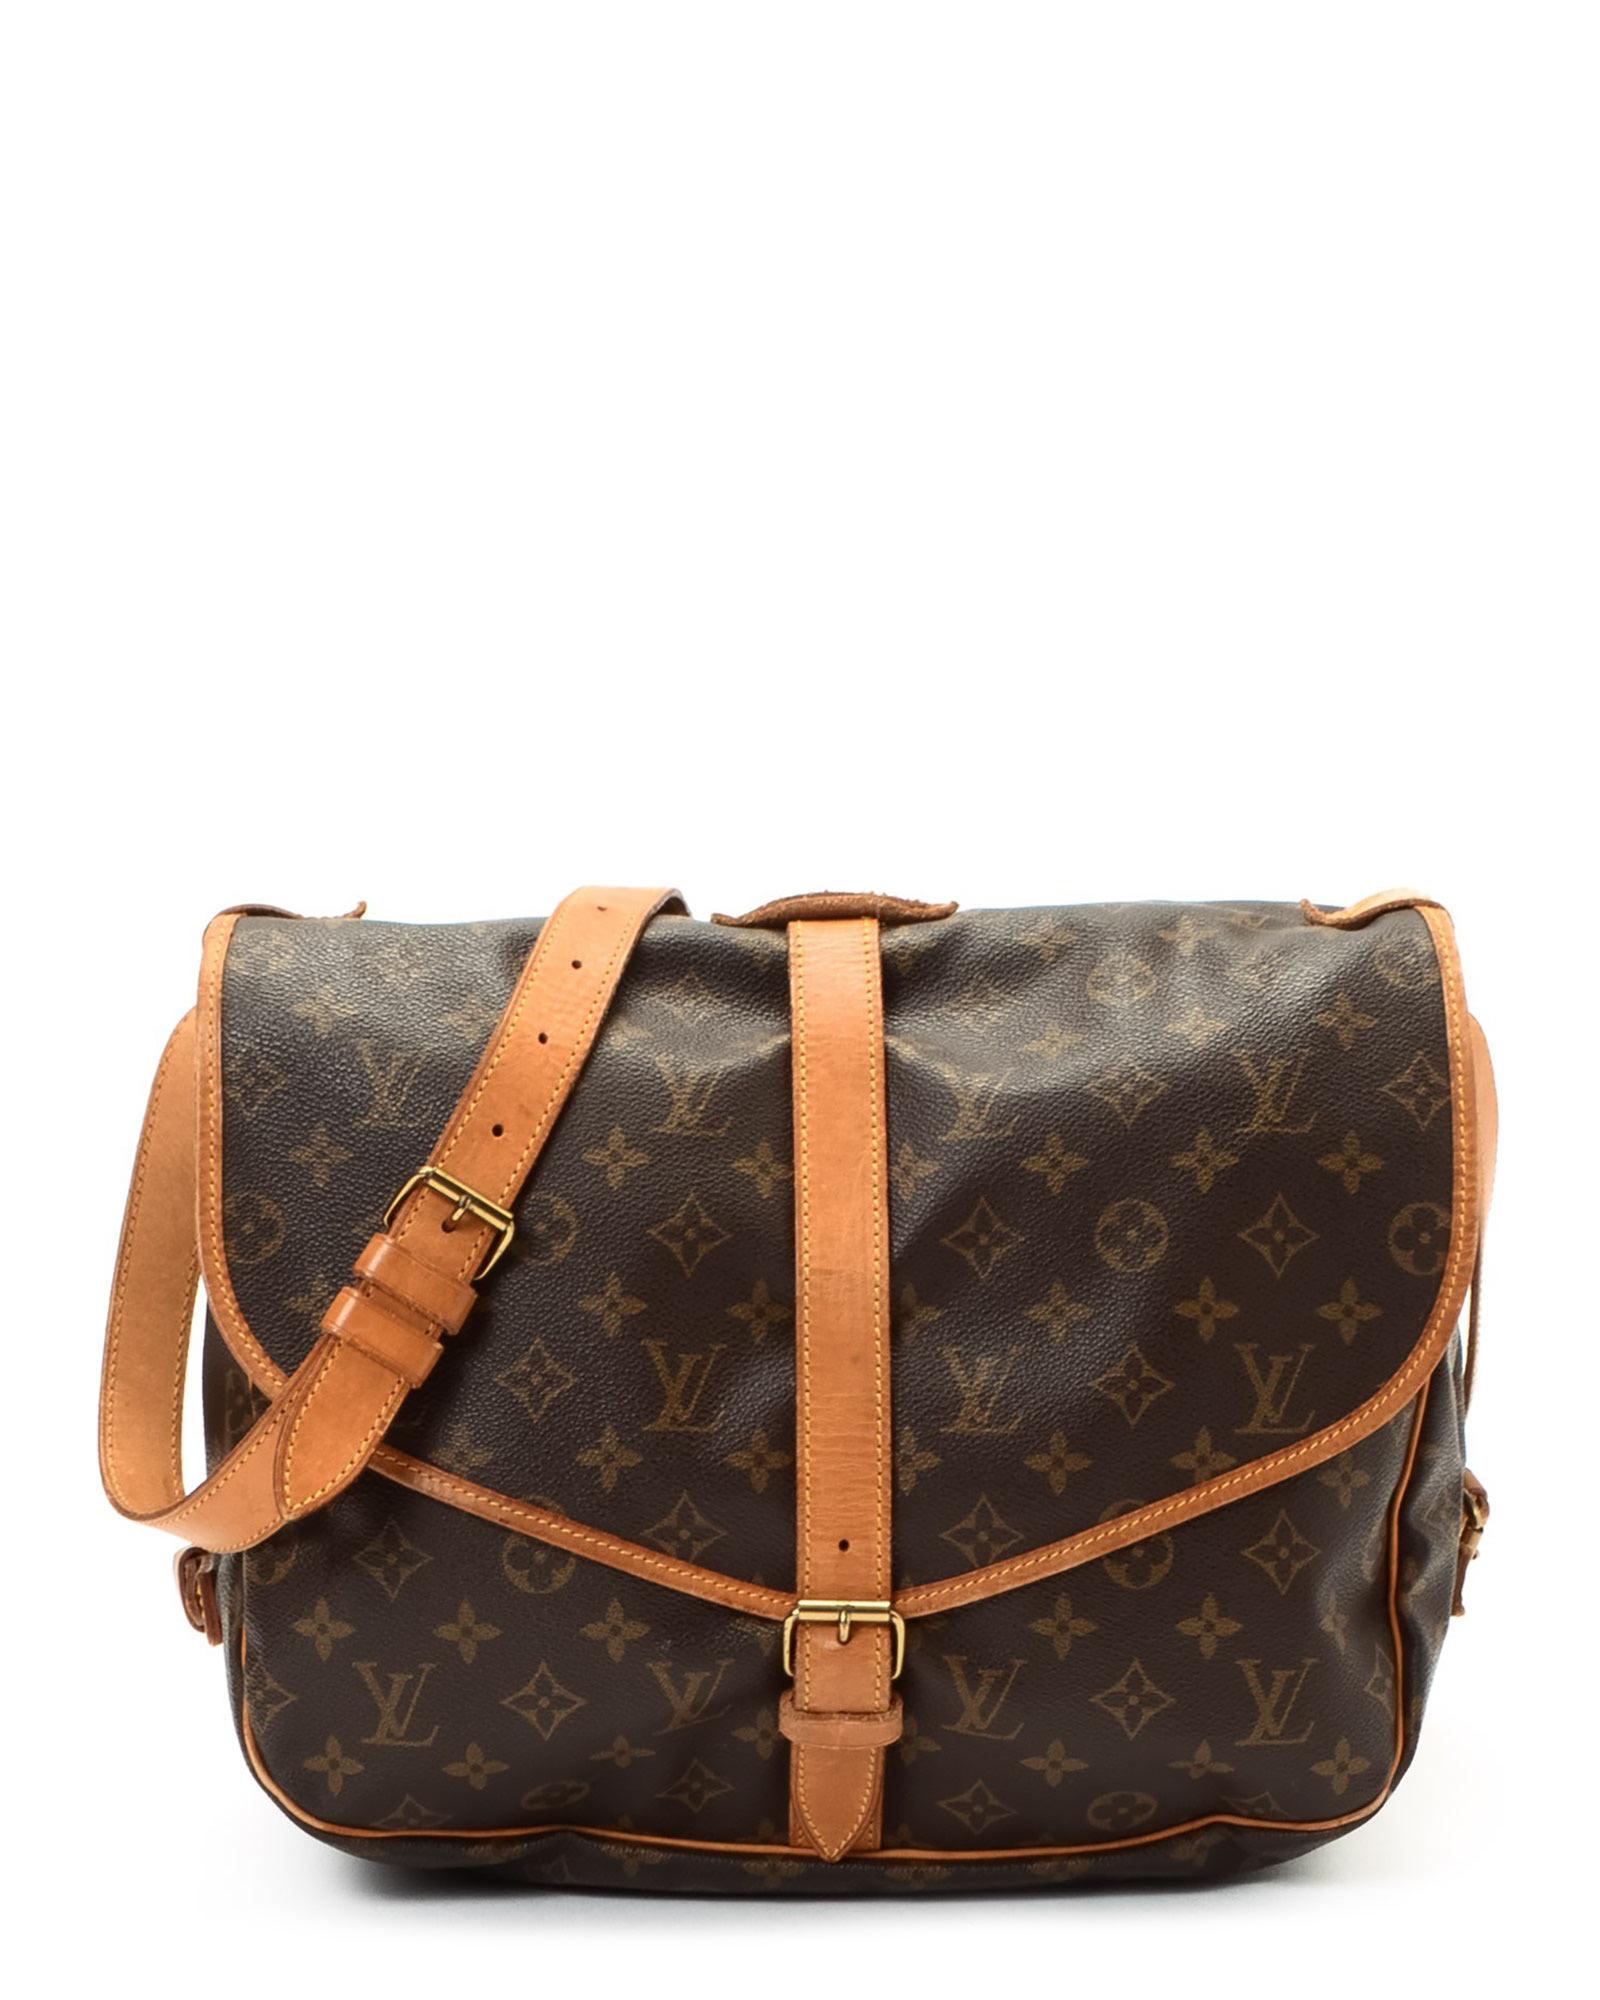 e9efb602cb00 Lyst - Louis Vuitton Messenger Bag - Vintage in Brown for Men